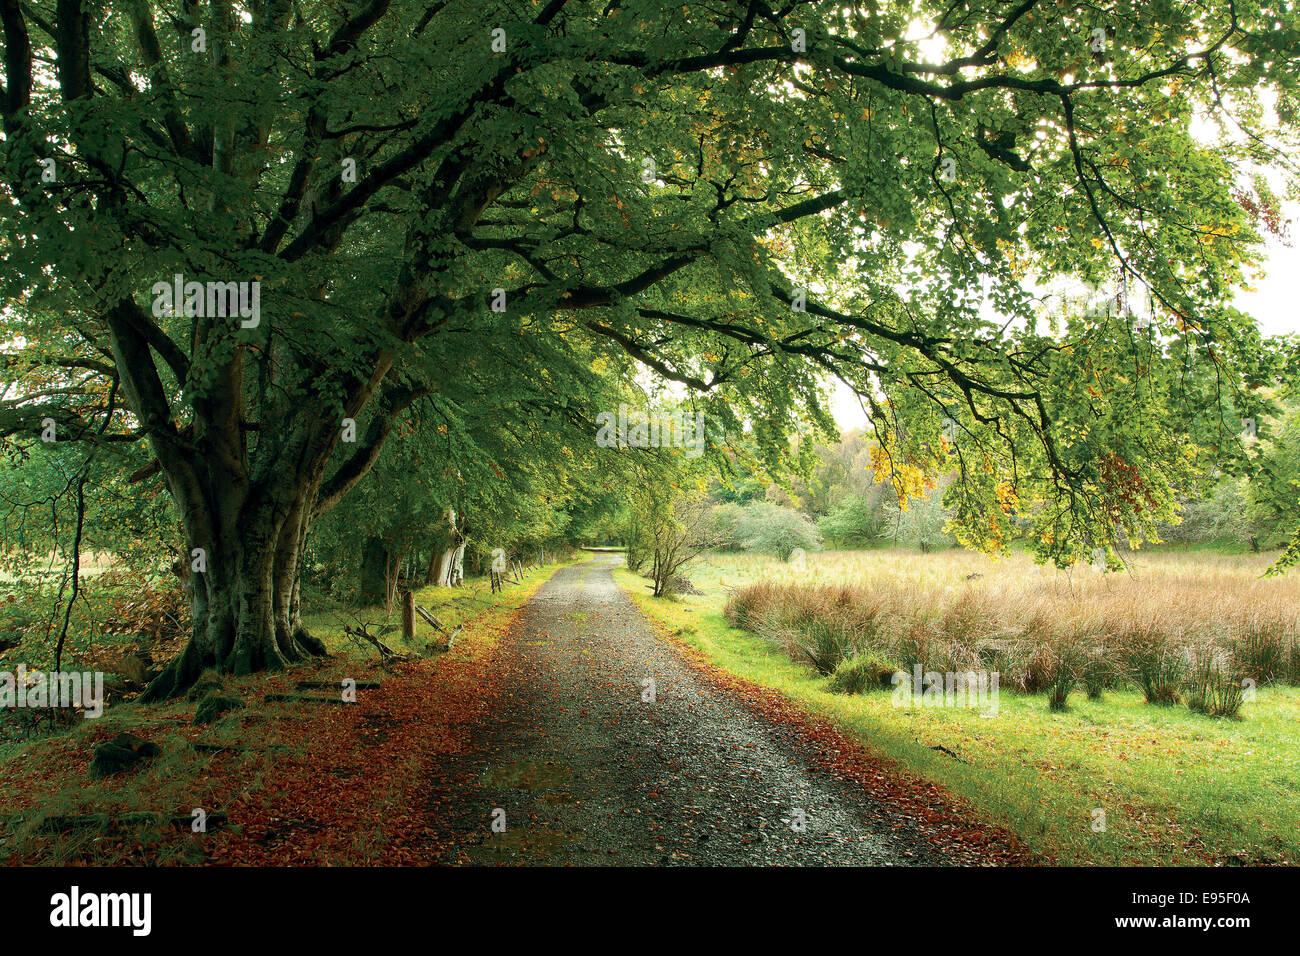 The Strath of Arisaig, Arisaig, Lochaber - Stock Image